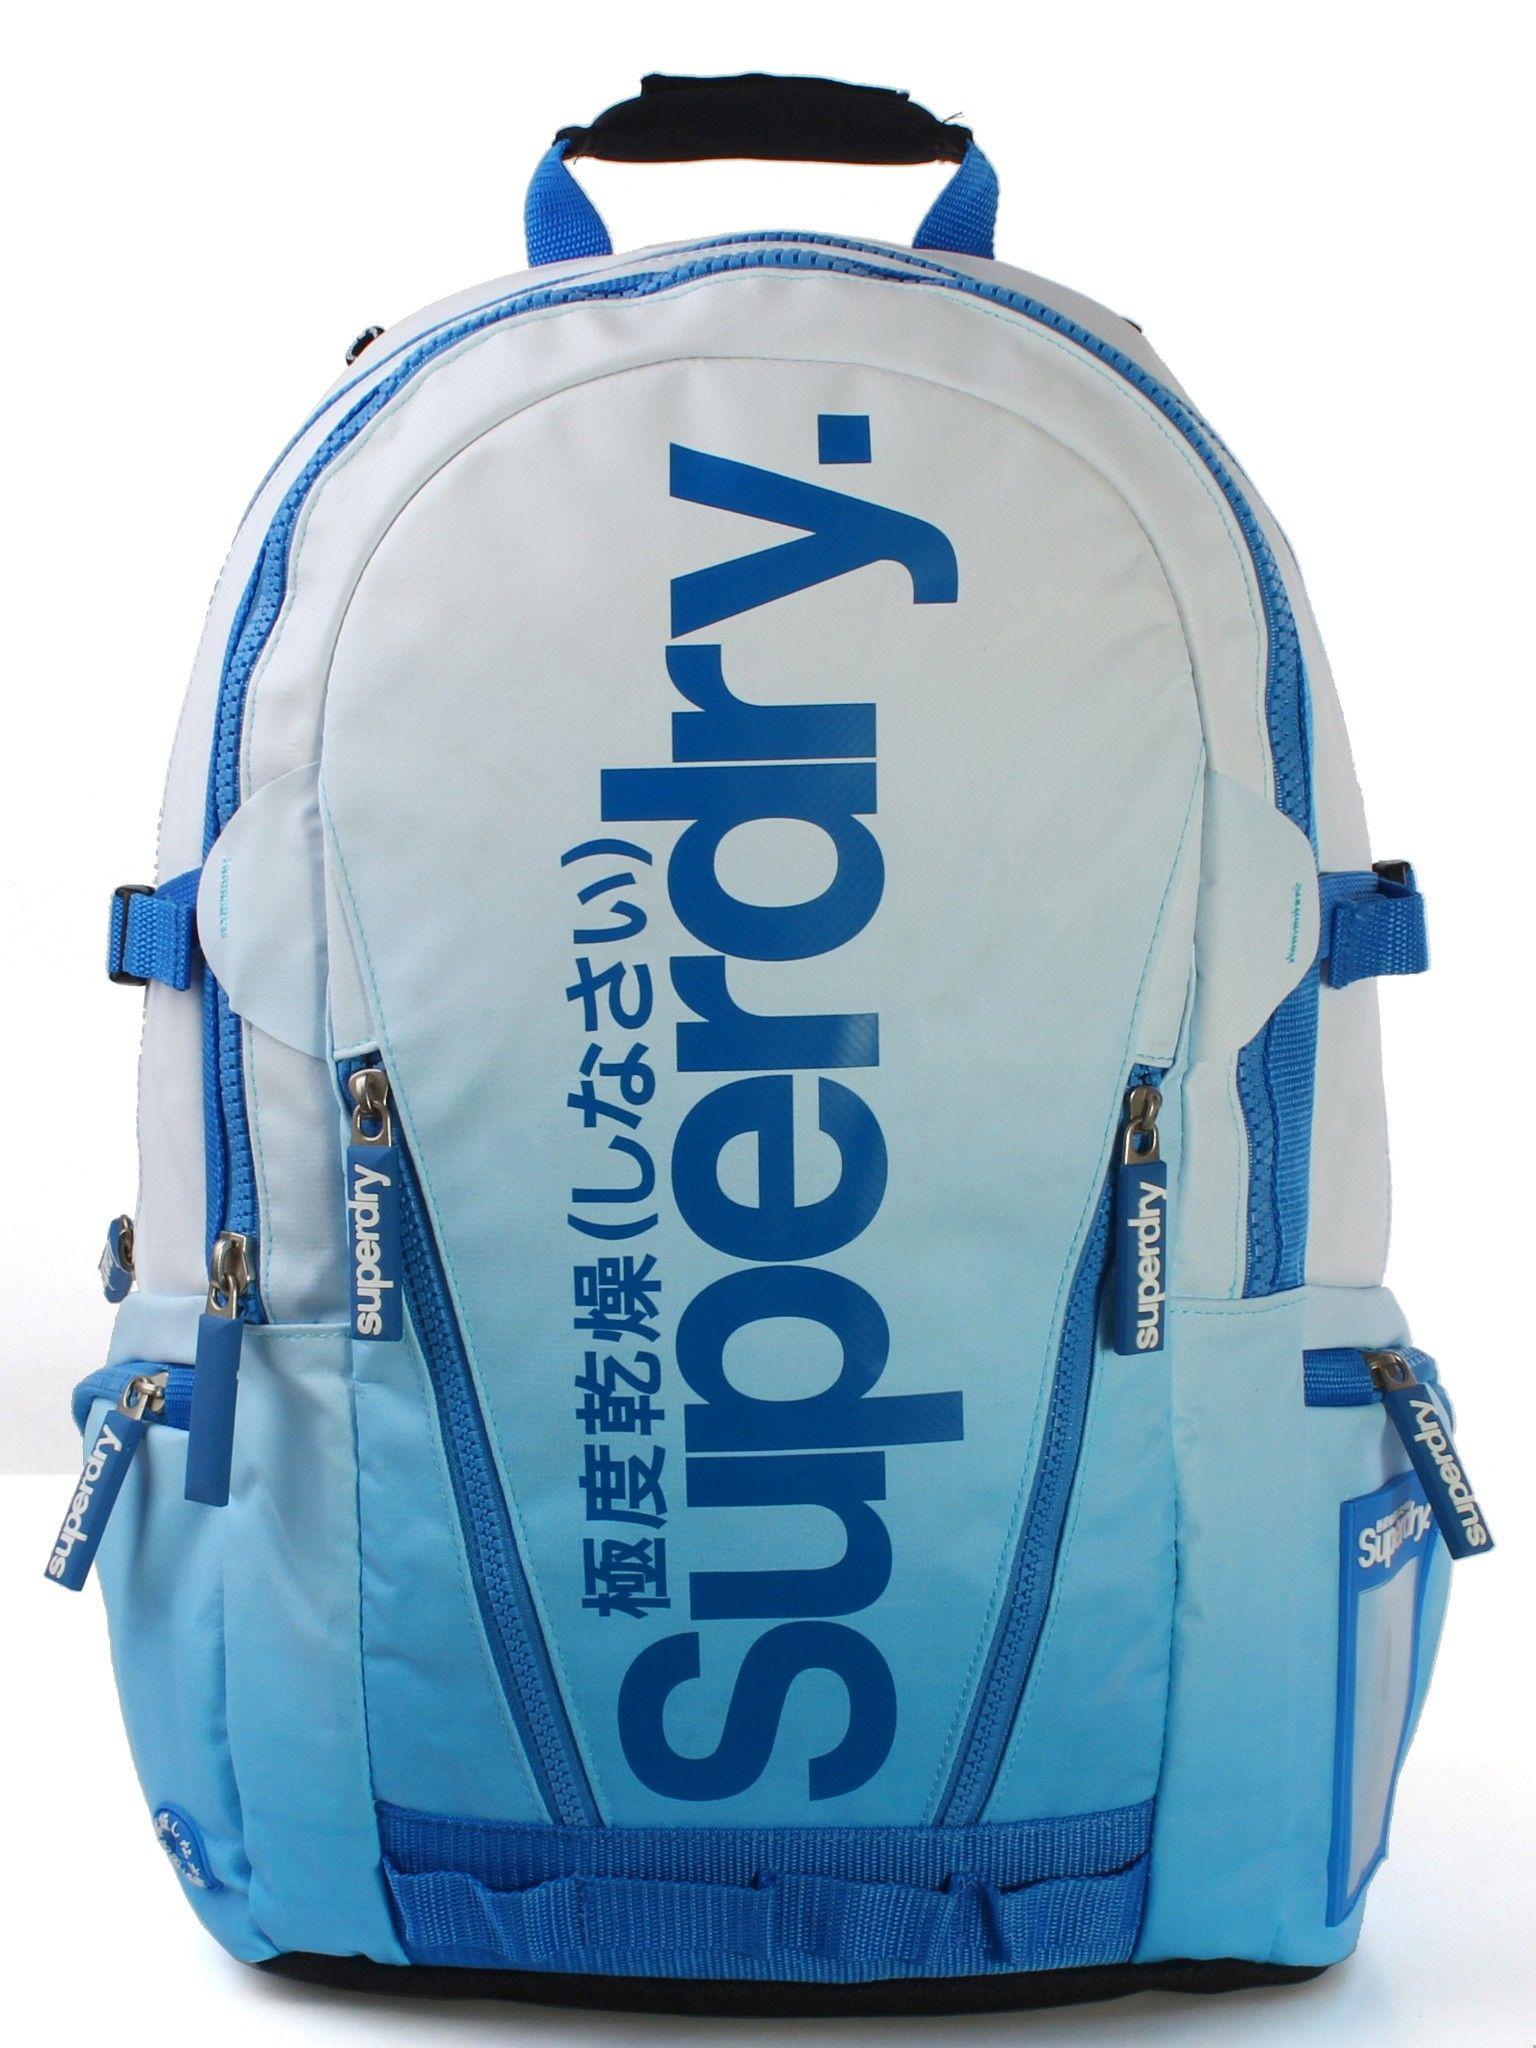 Superdry - Dip Tarp Backpack สีฟ้า (Dip Blue)